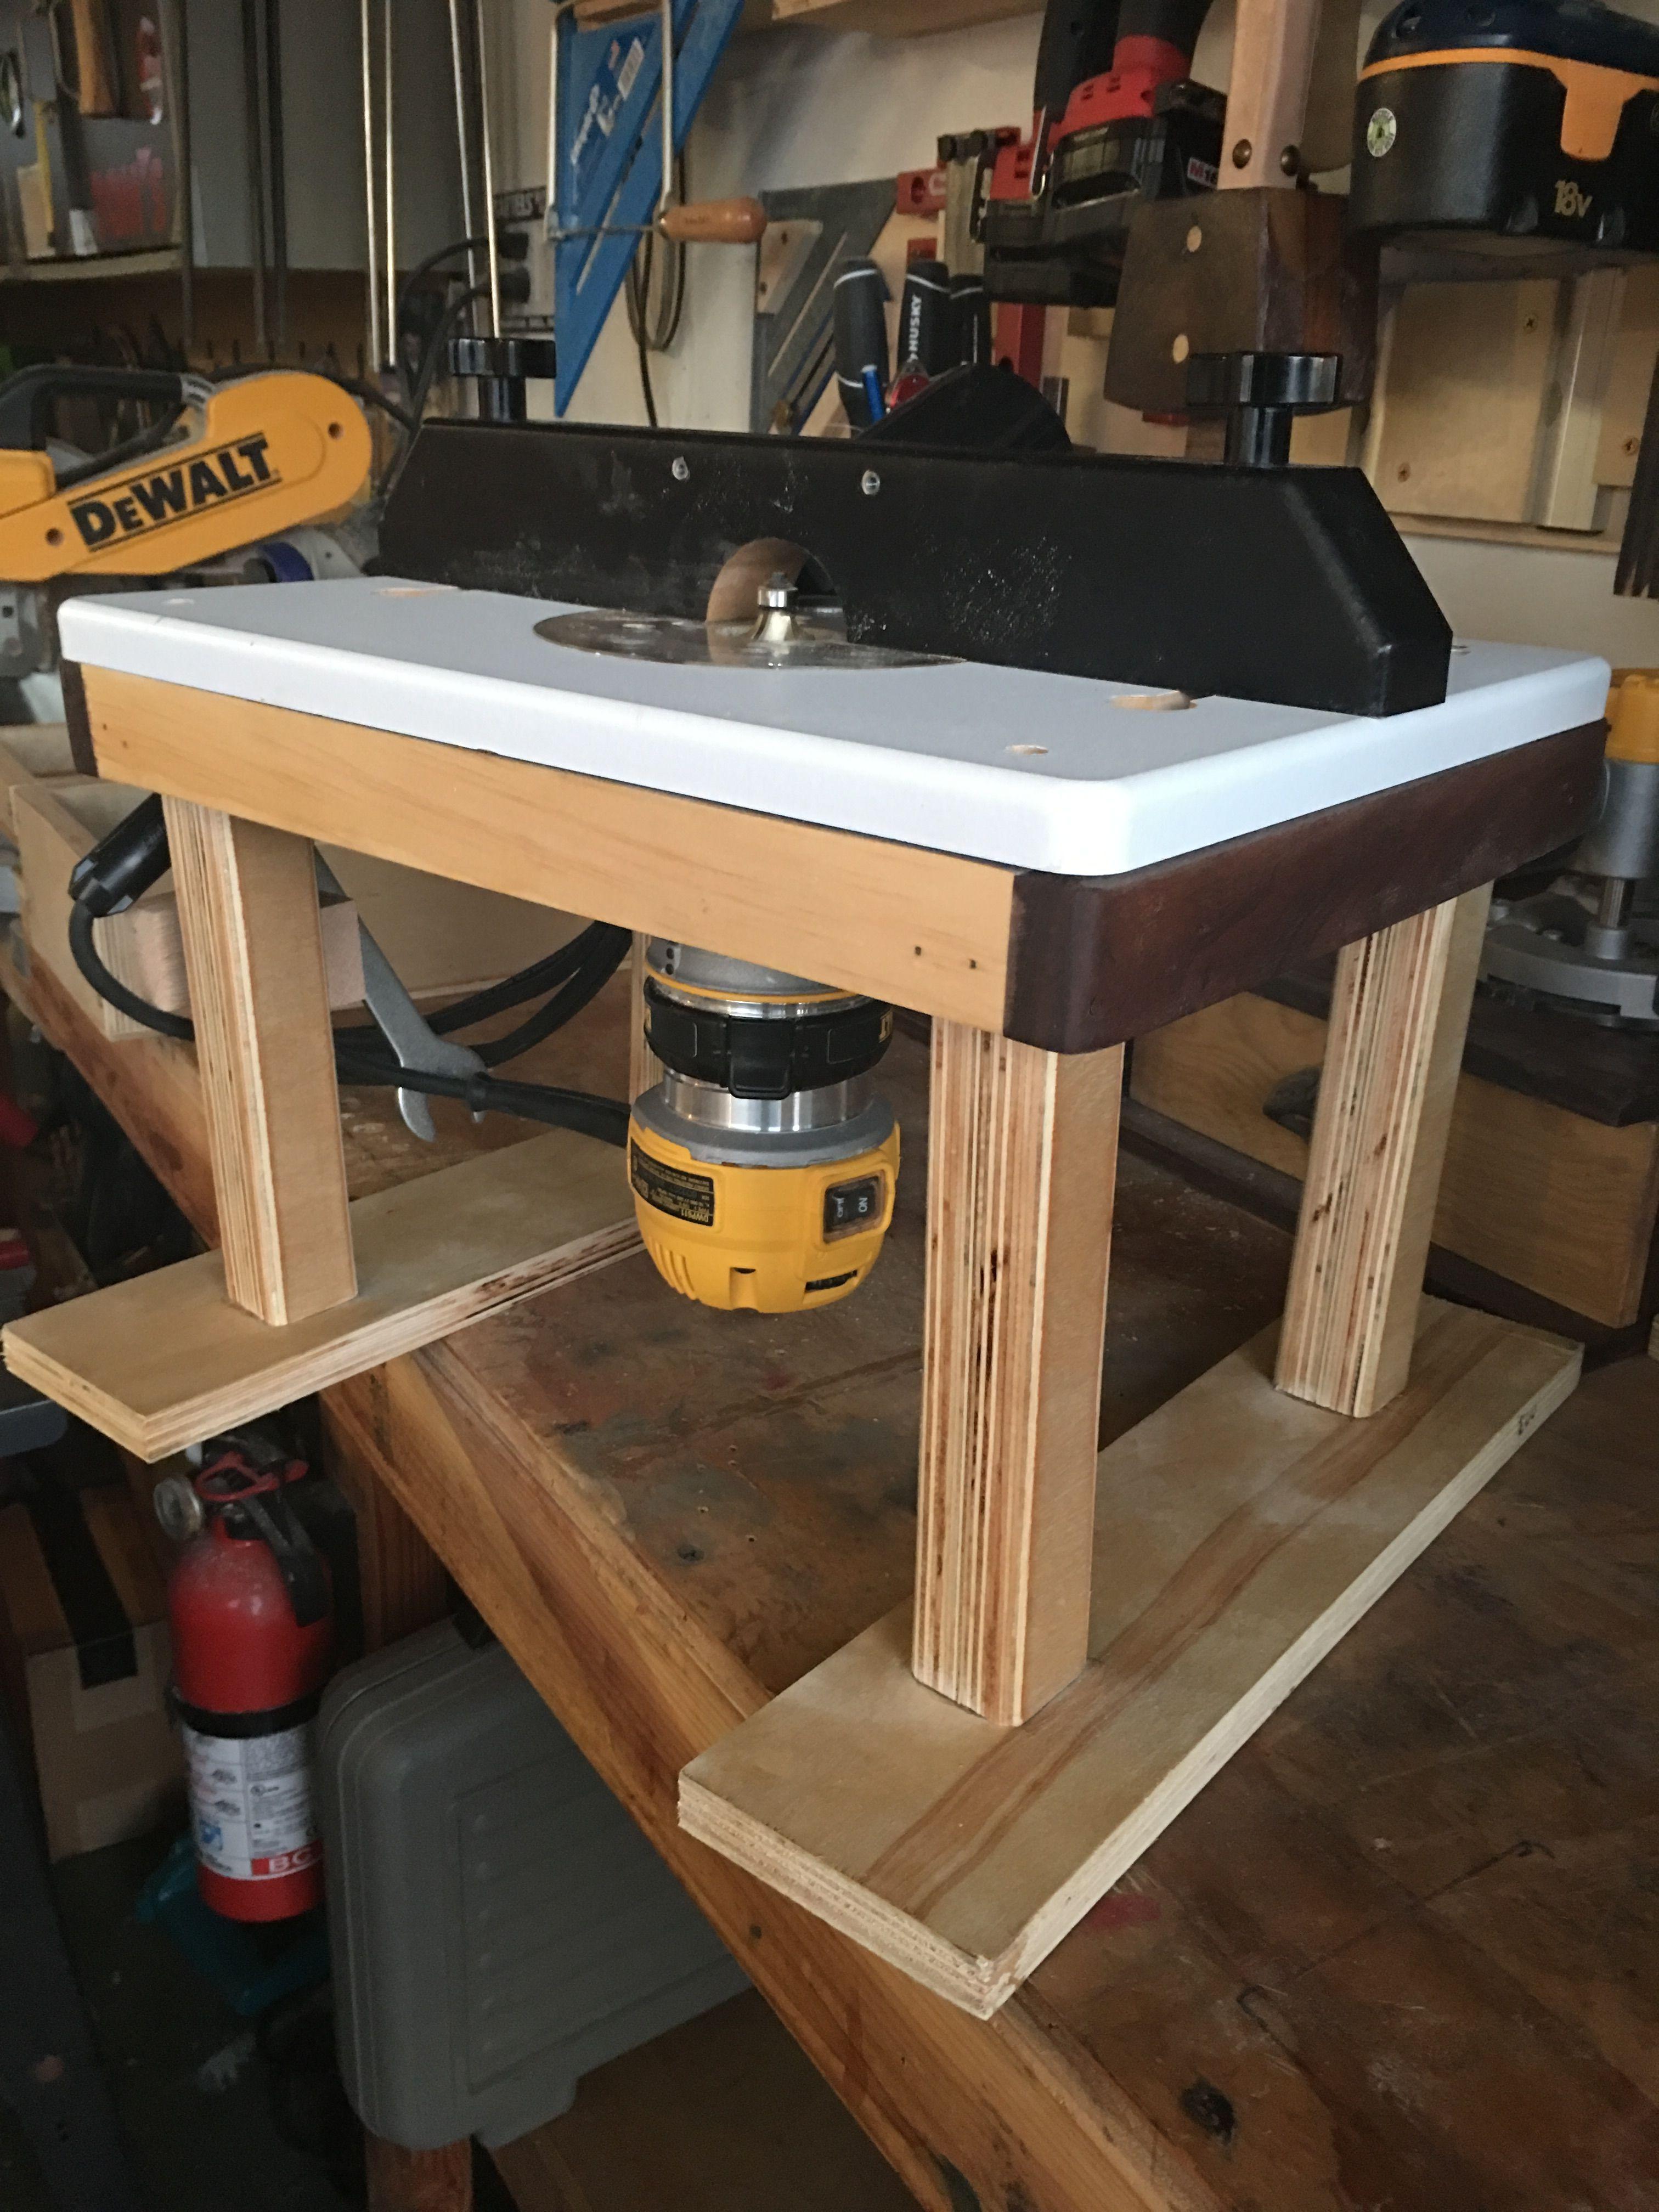 Rockler trim router table modification wood working pinterest rockler trim router table modification keyboard keysfo Images